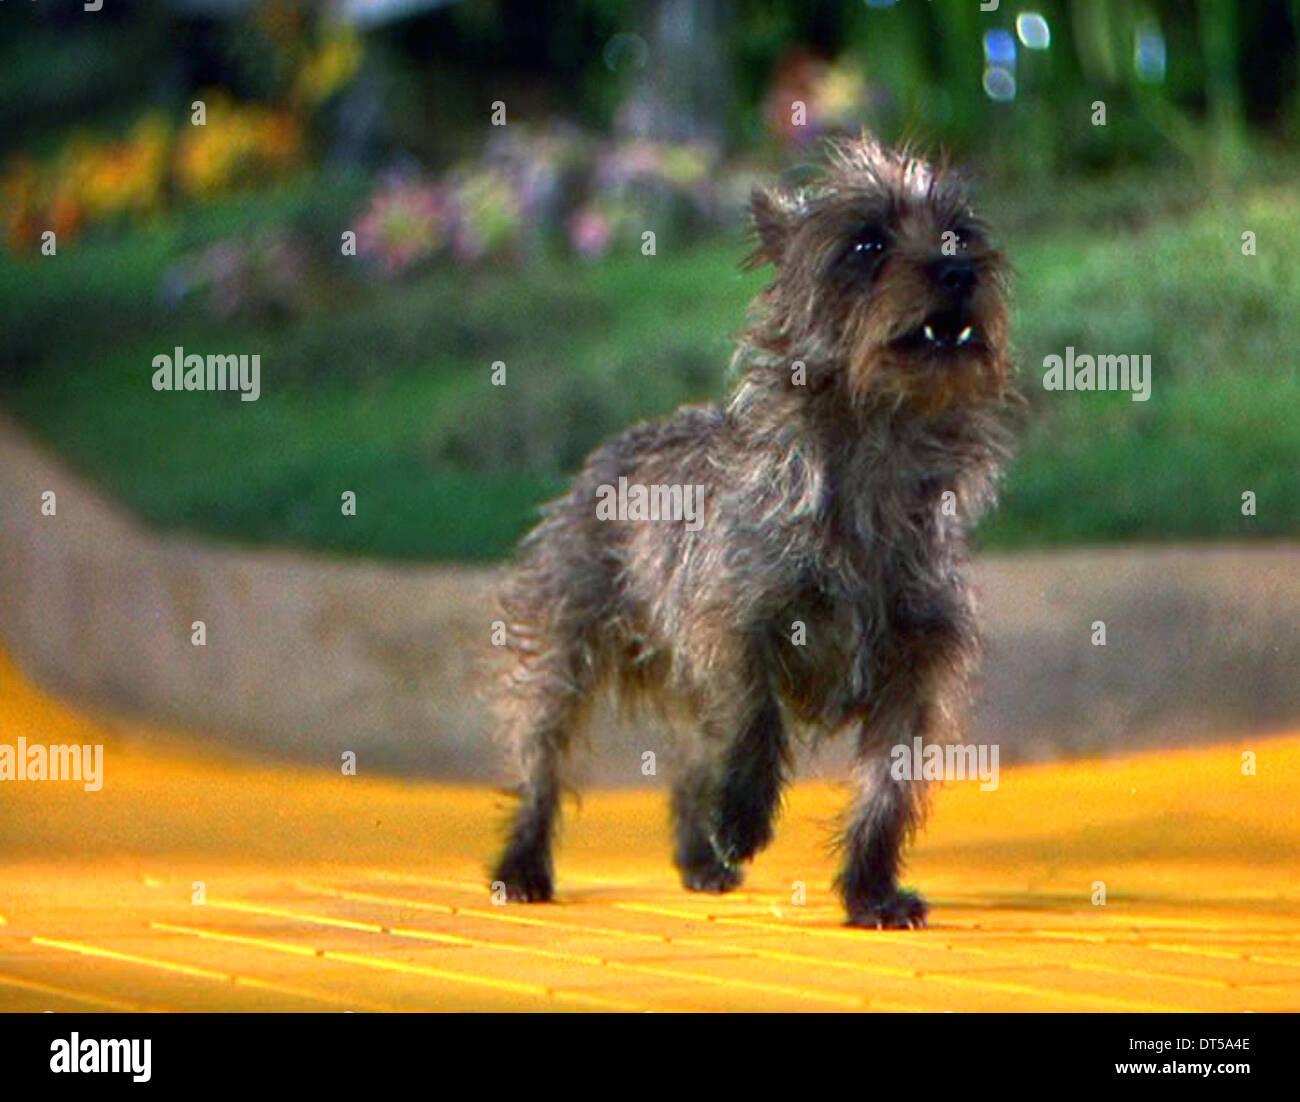 Dog In Wizard Of Oz Name